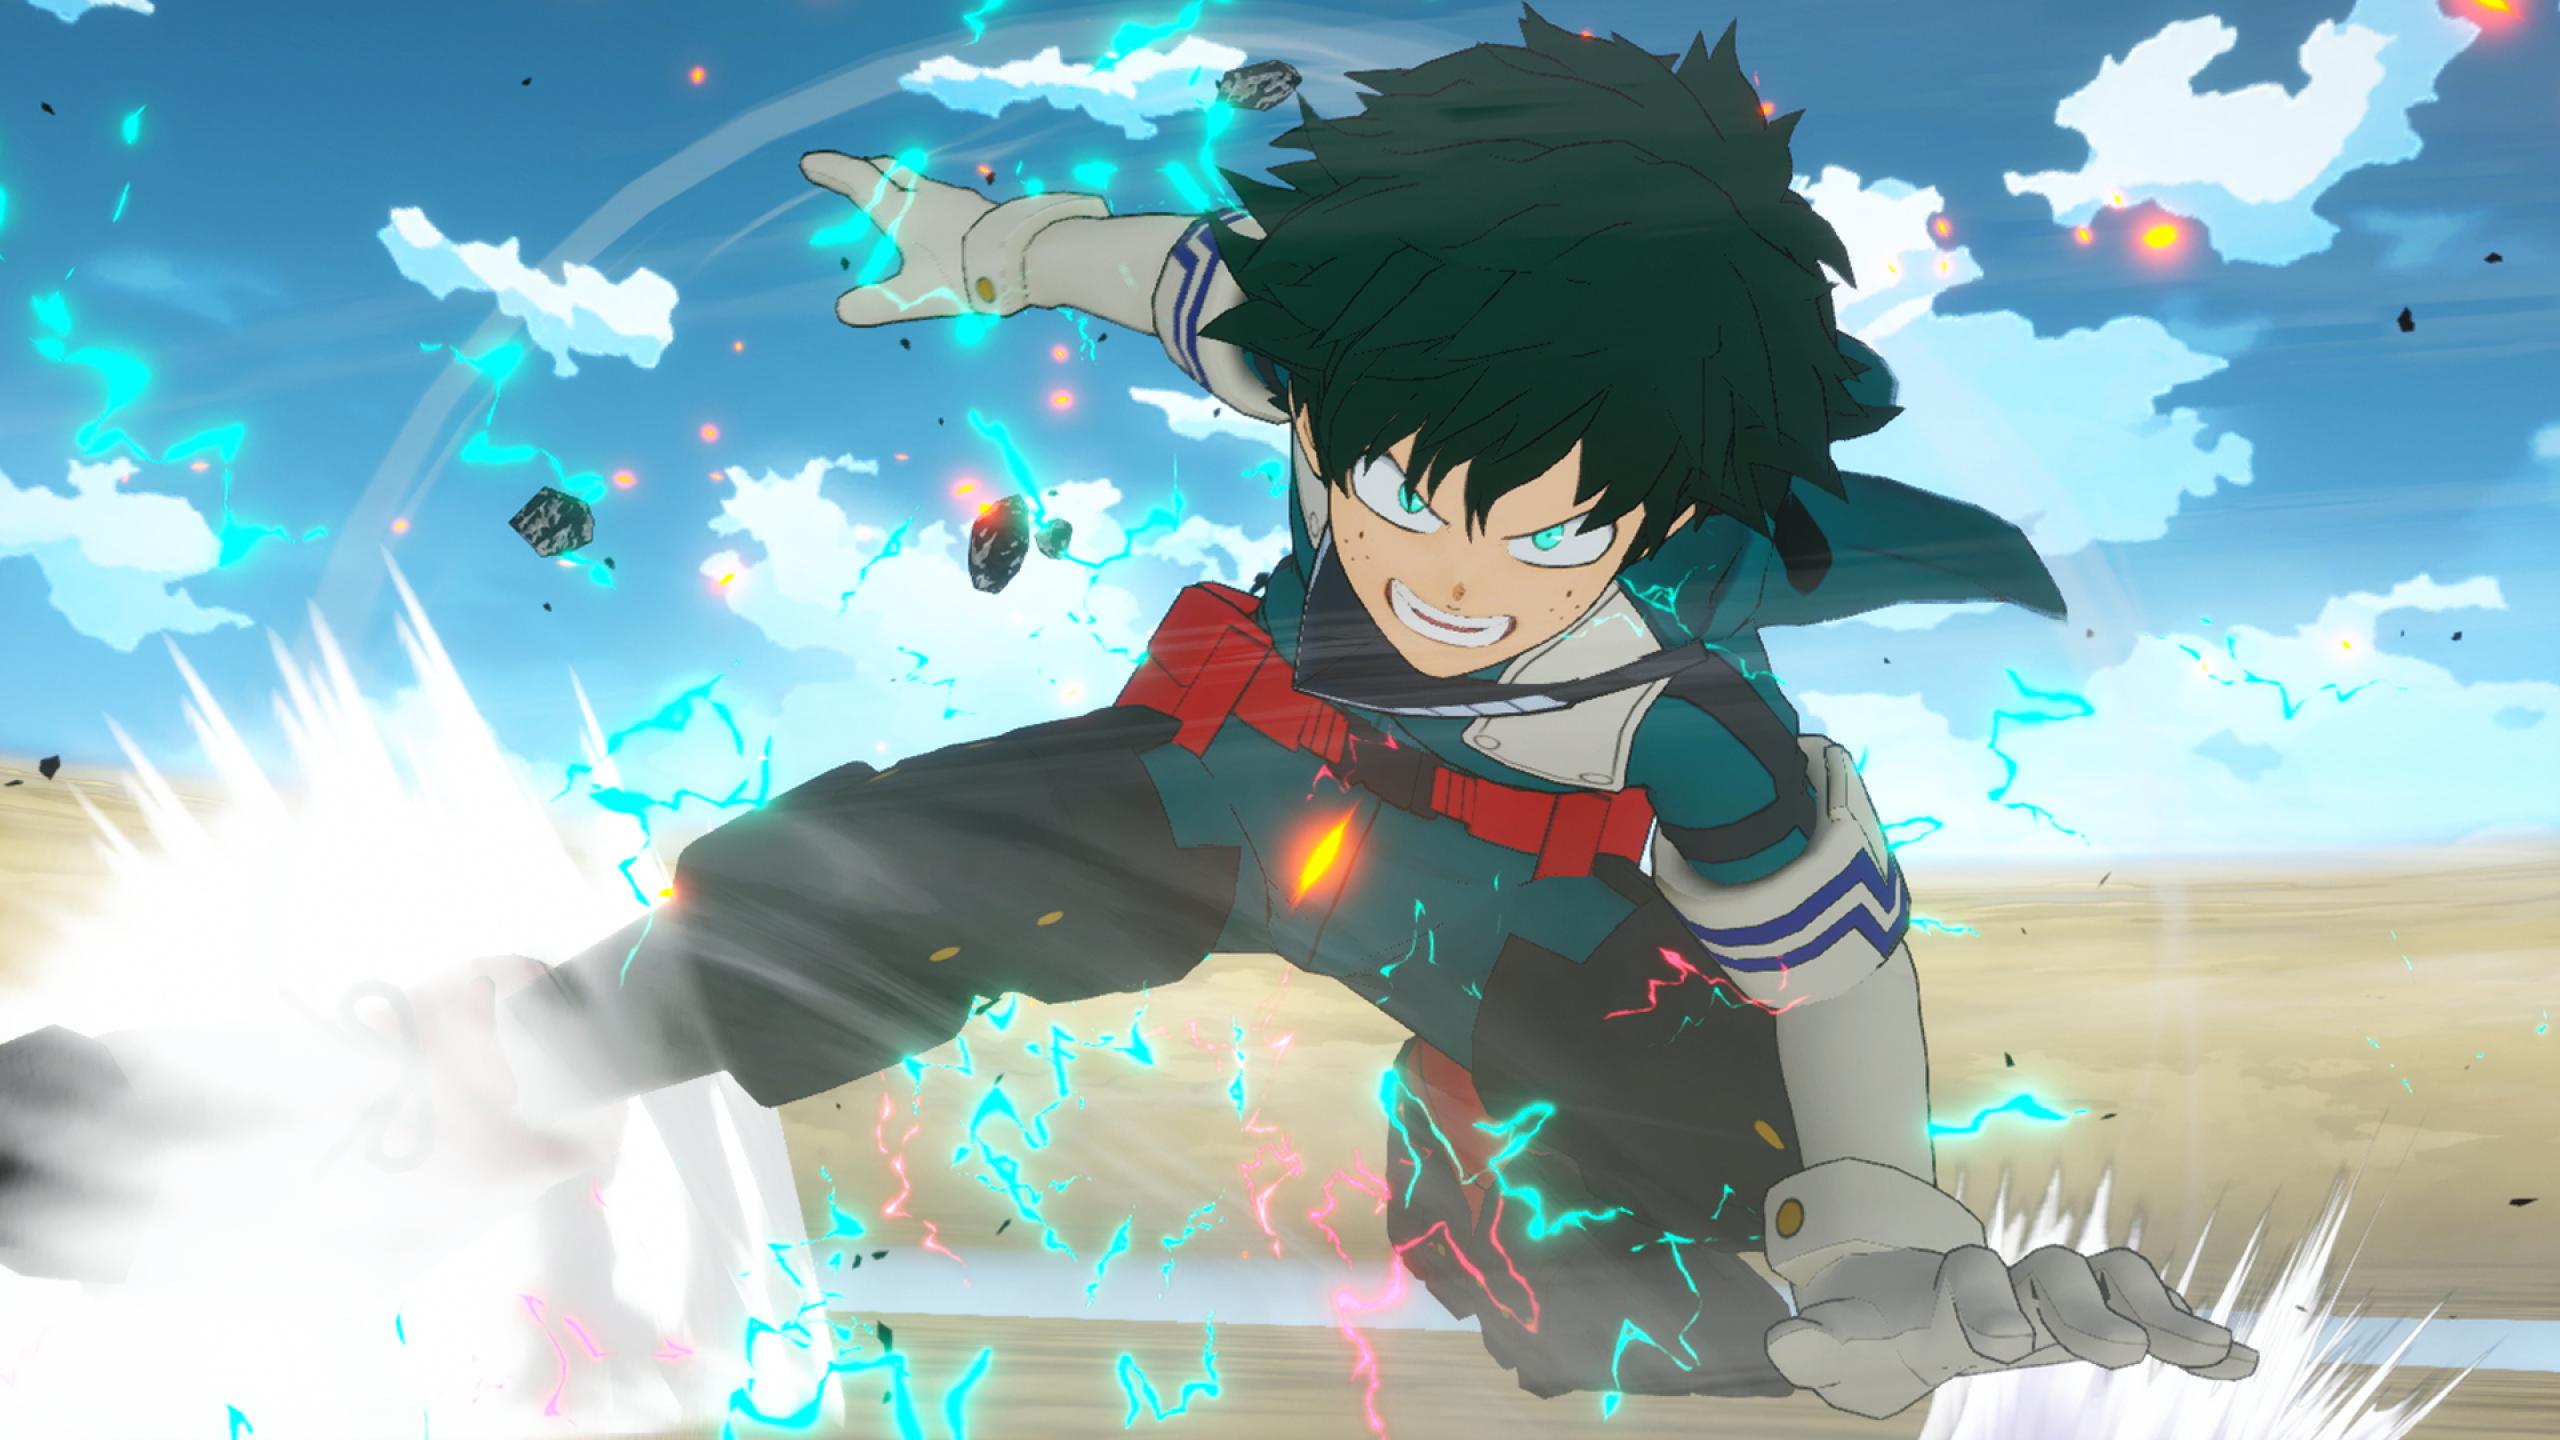 2560x1440 Izuku Midoriya Anime 1440p Resolution Wallpaper Hd Anime 4k Wallpapers Images Photos And Background